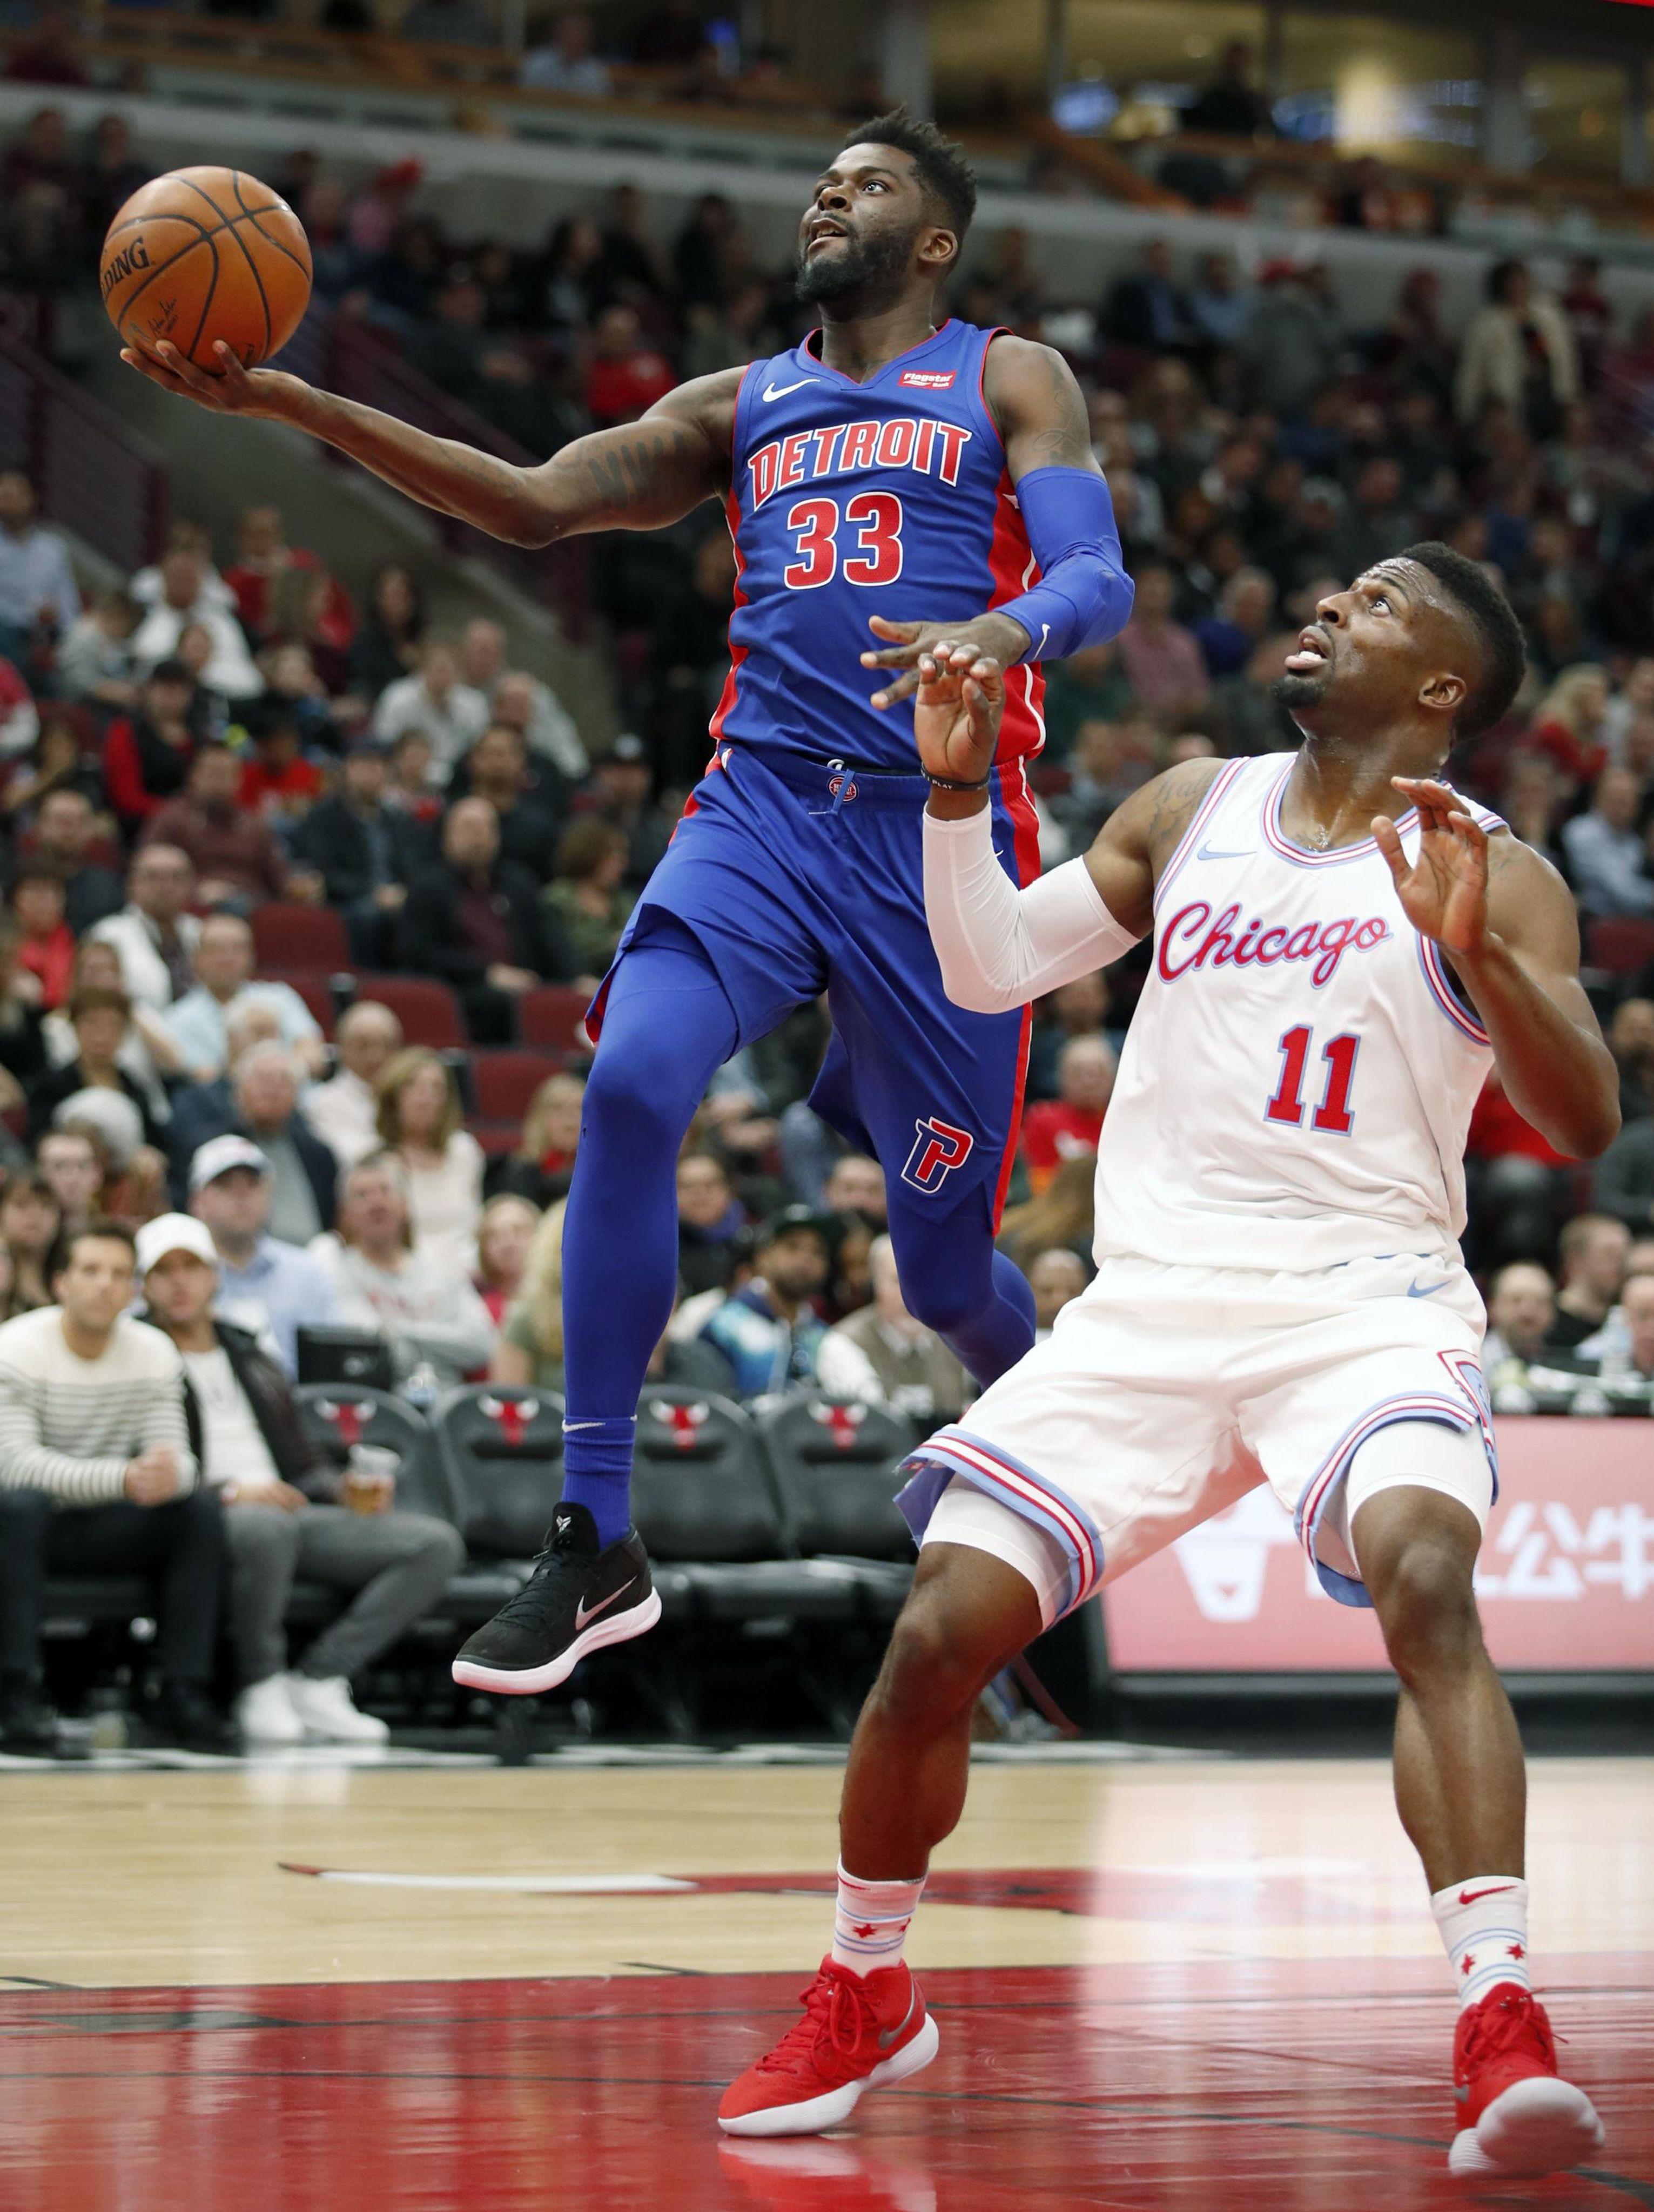 Pistons_bulls_basketball_63200_s3062x4096